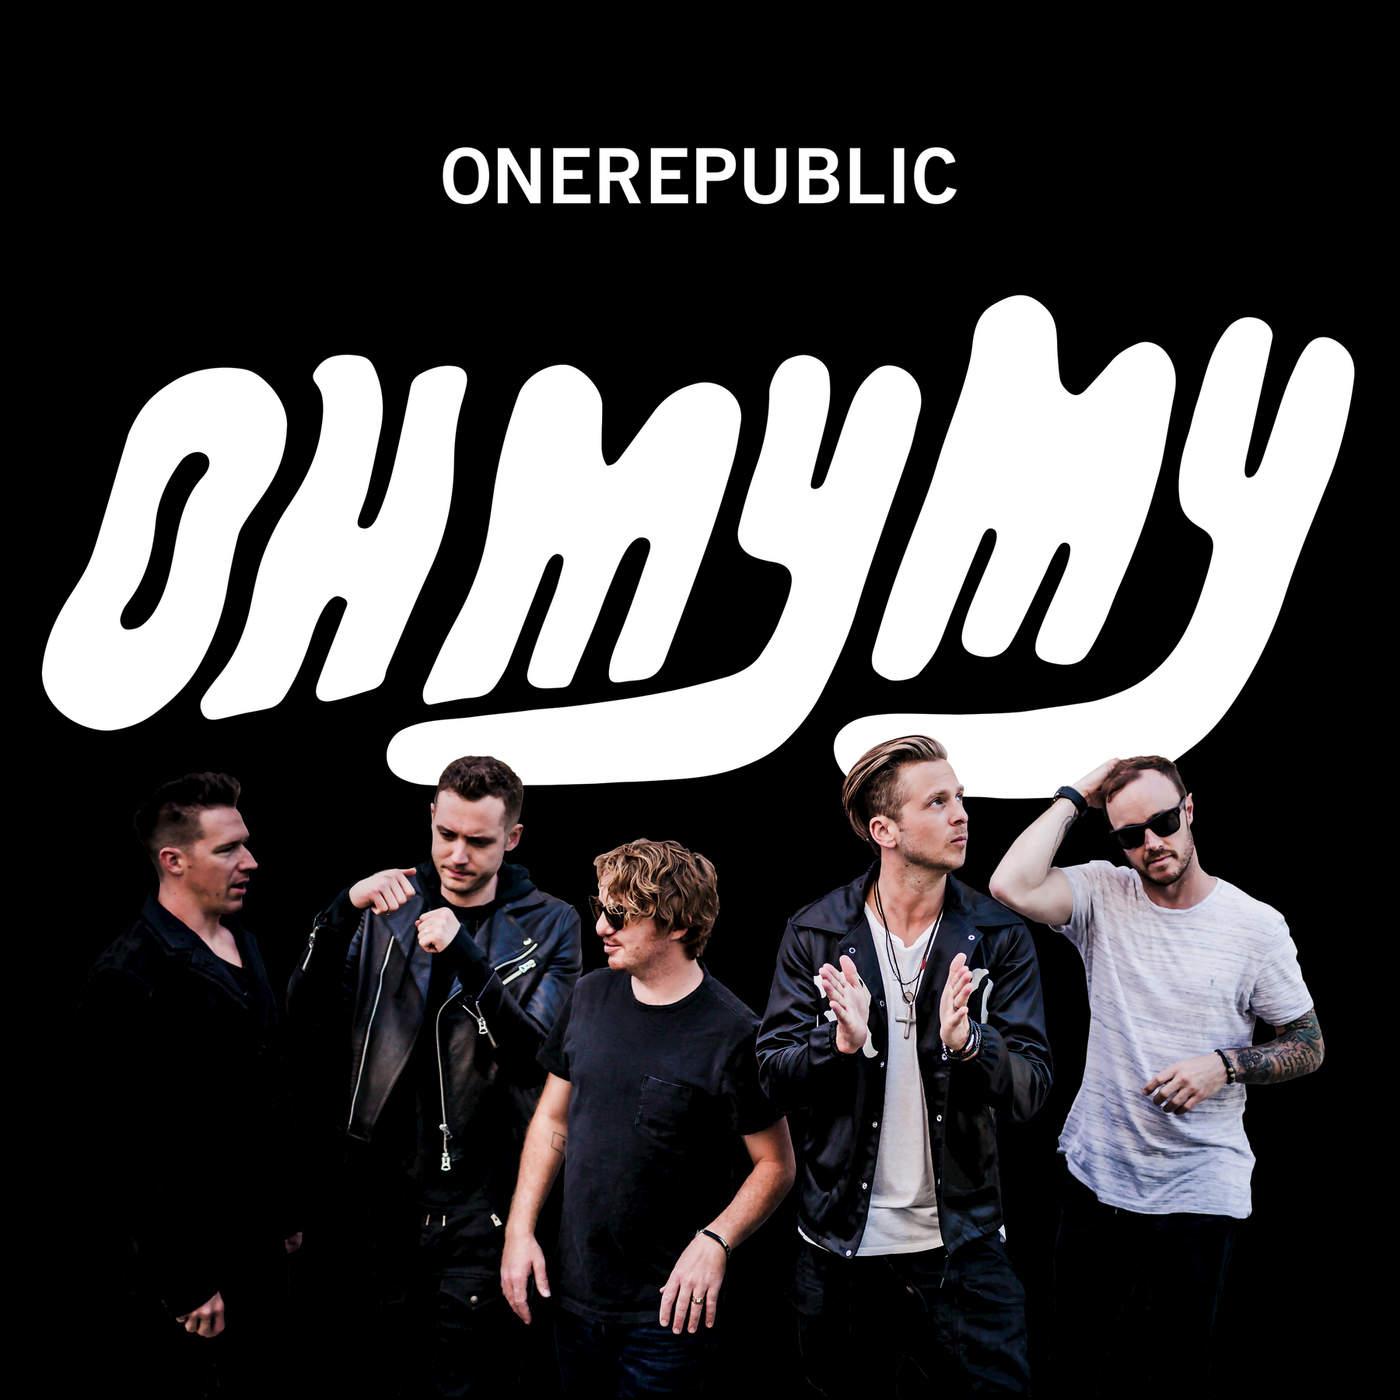 OneRepublic - Oh My My Cover